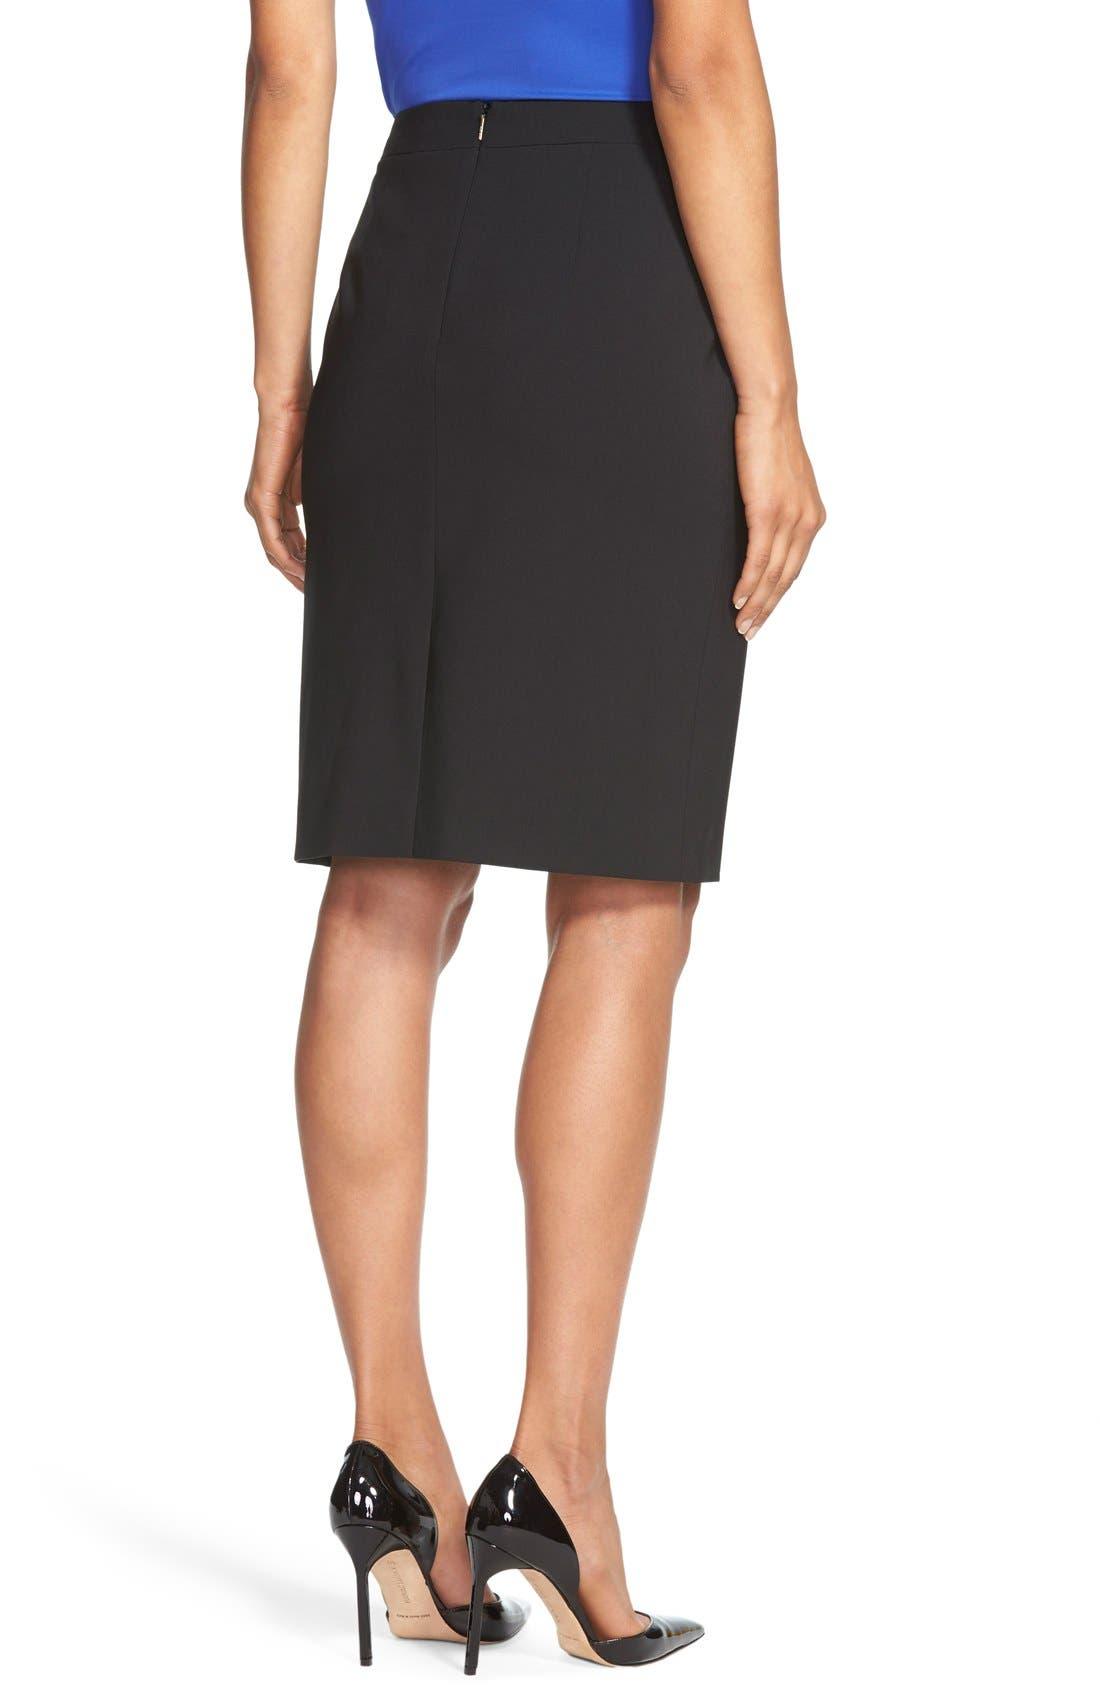 Vilea Tropical Stretch Wool Pencil Skirt,                             Alternate thumbnail 24, color,